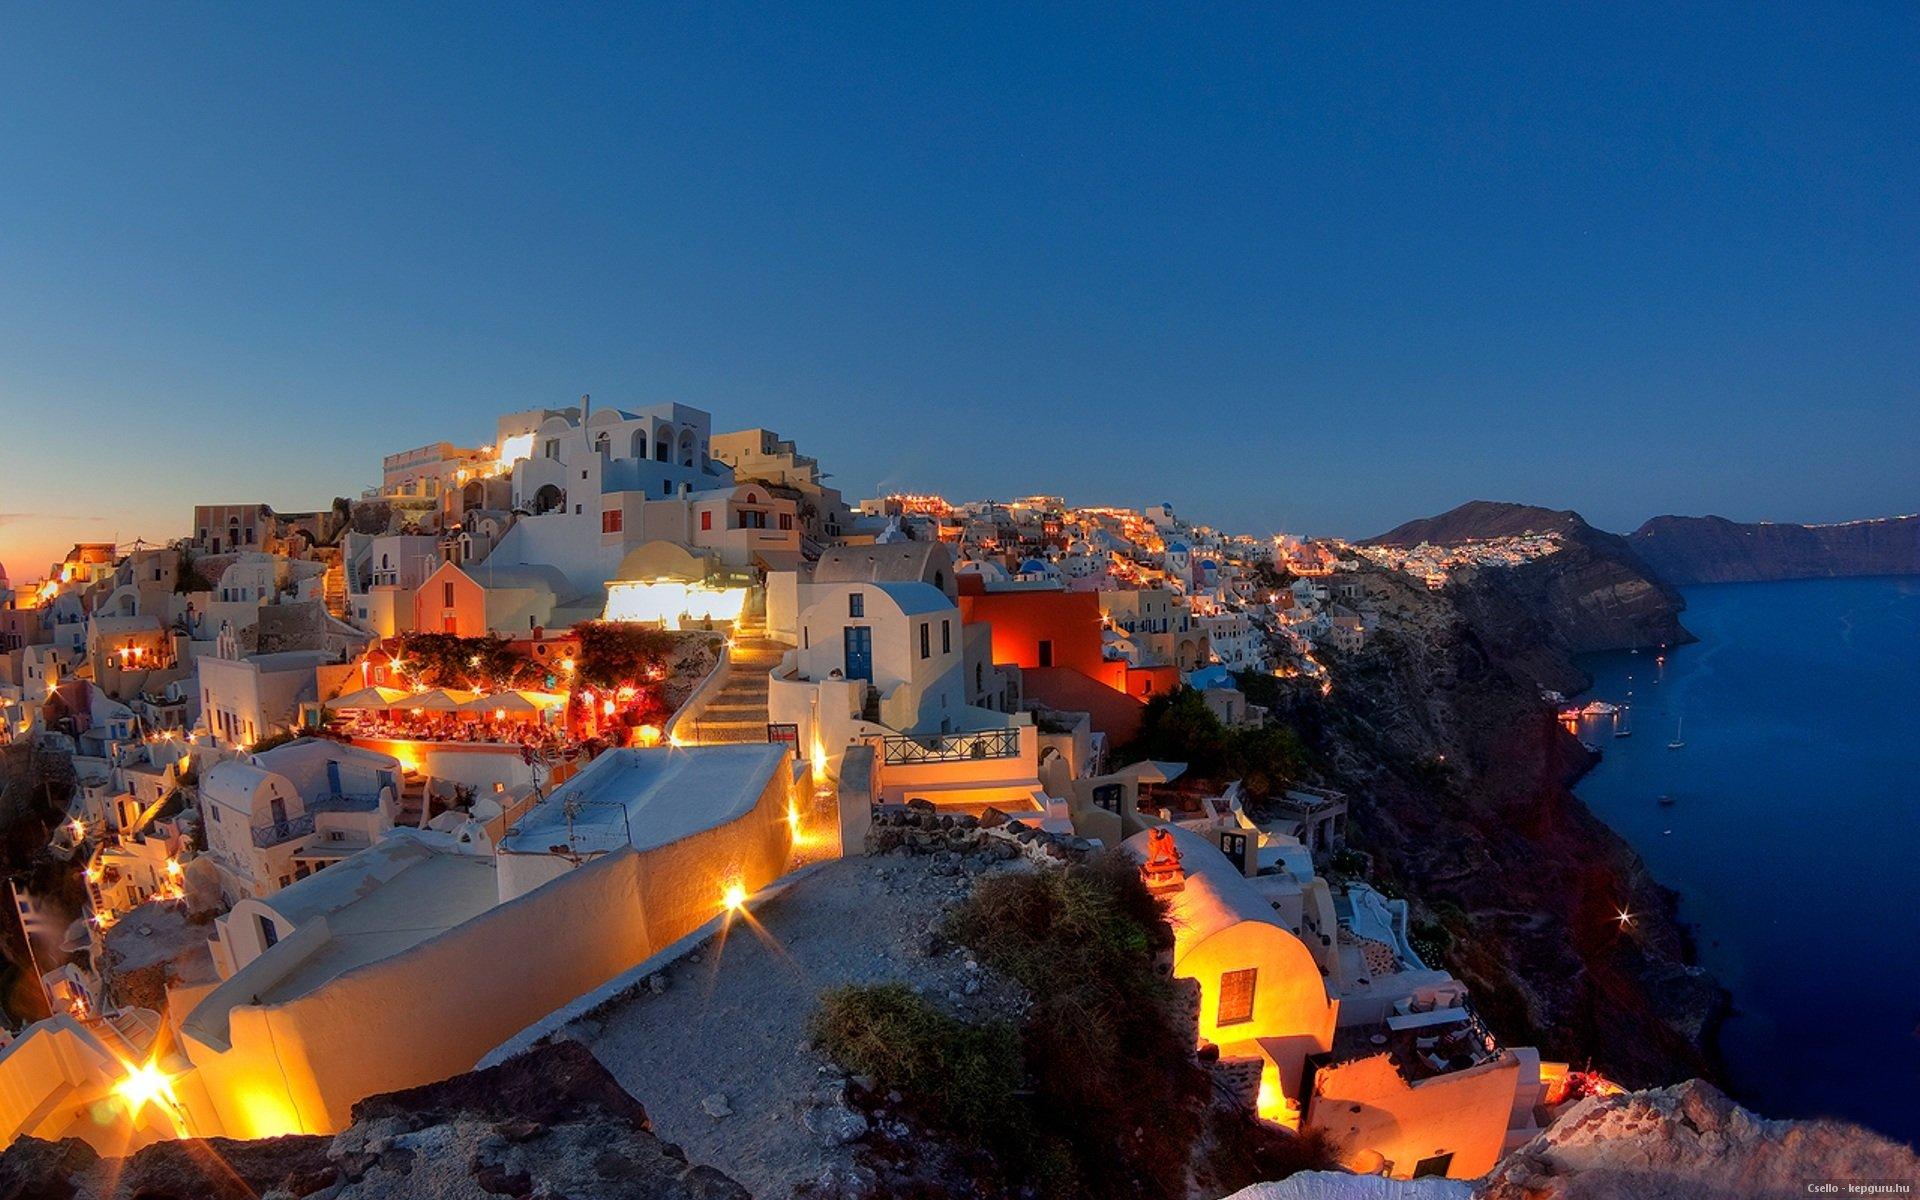 greece wallpapers santorini hd - photo #25